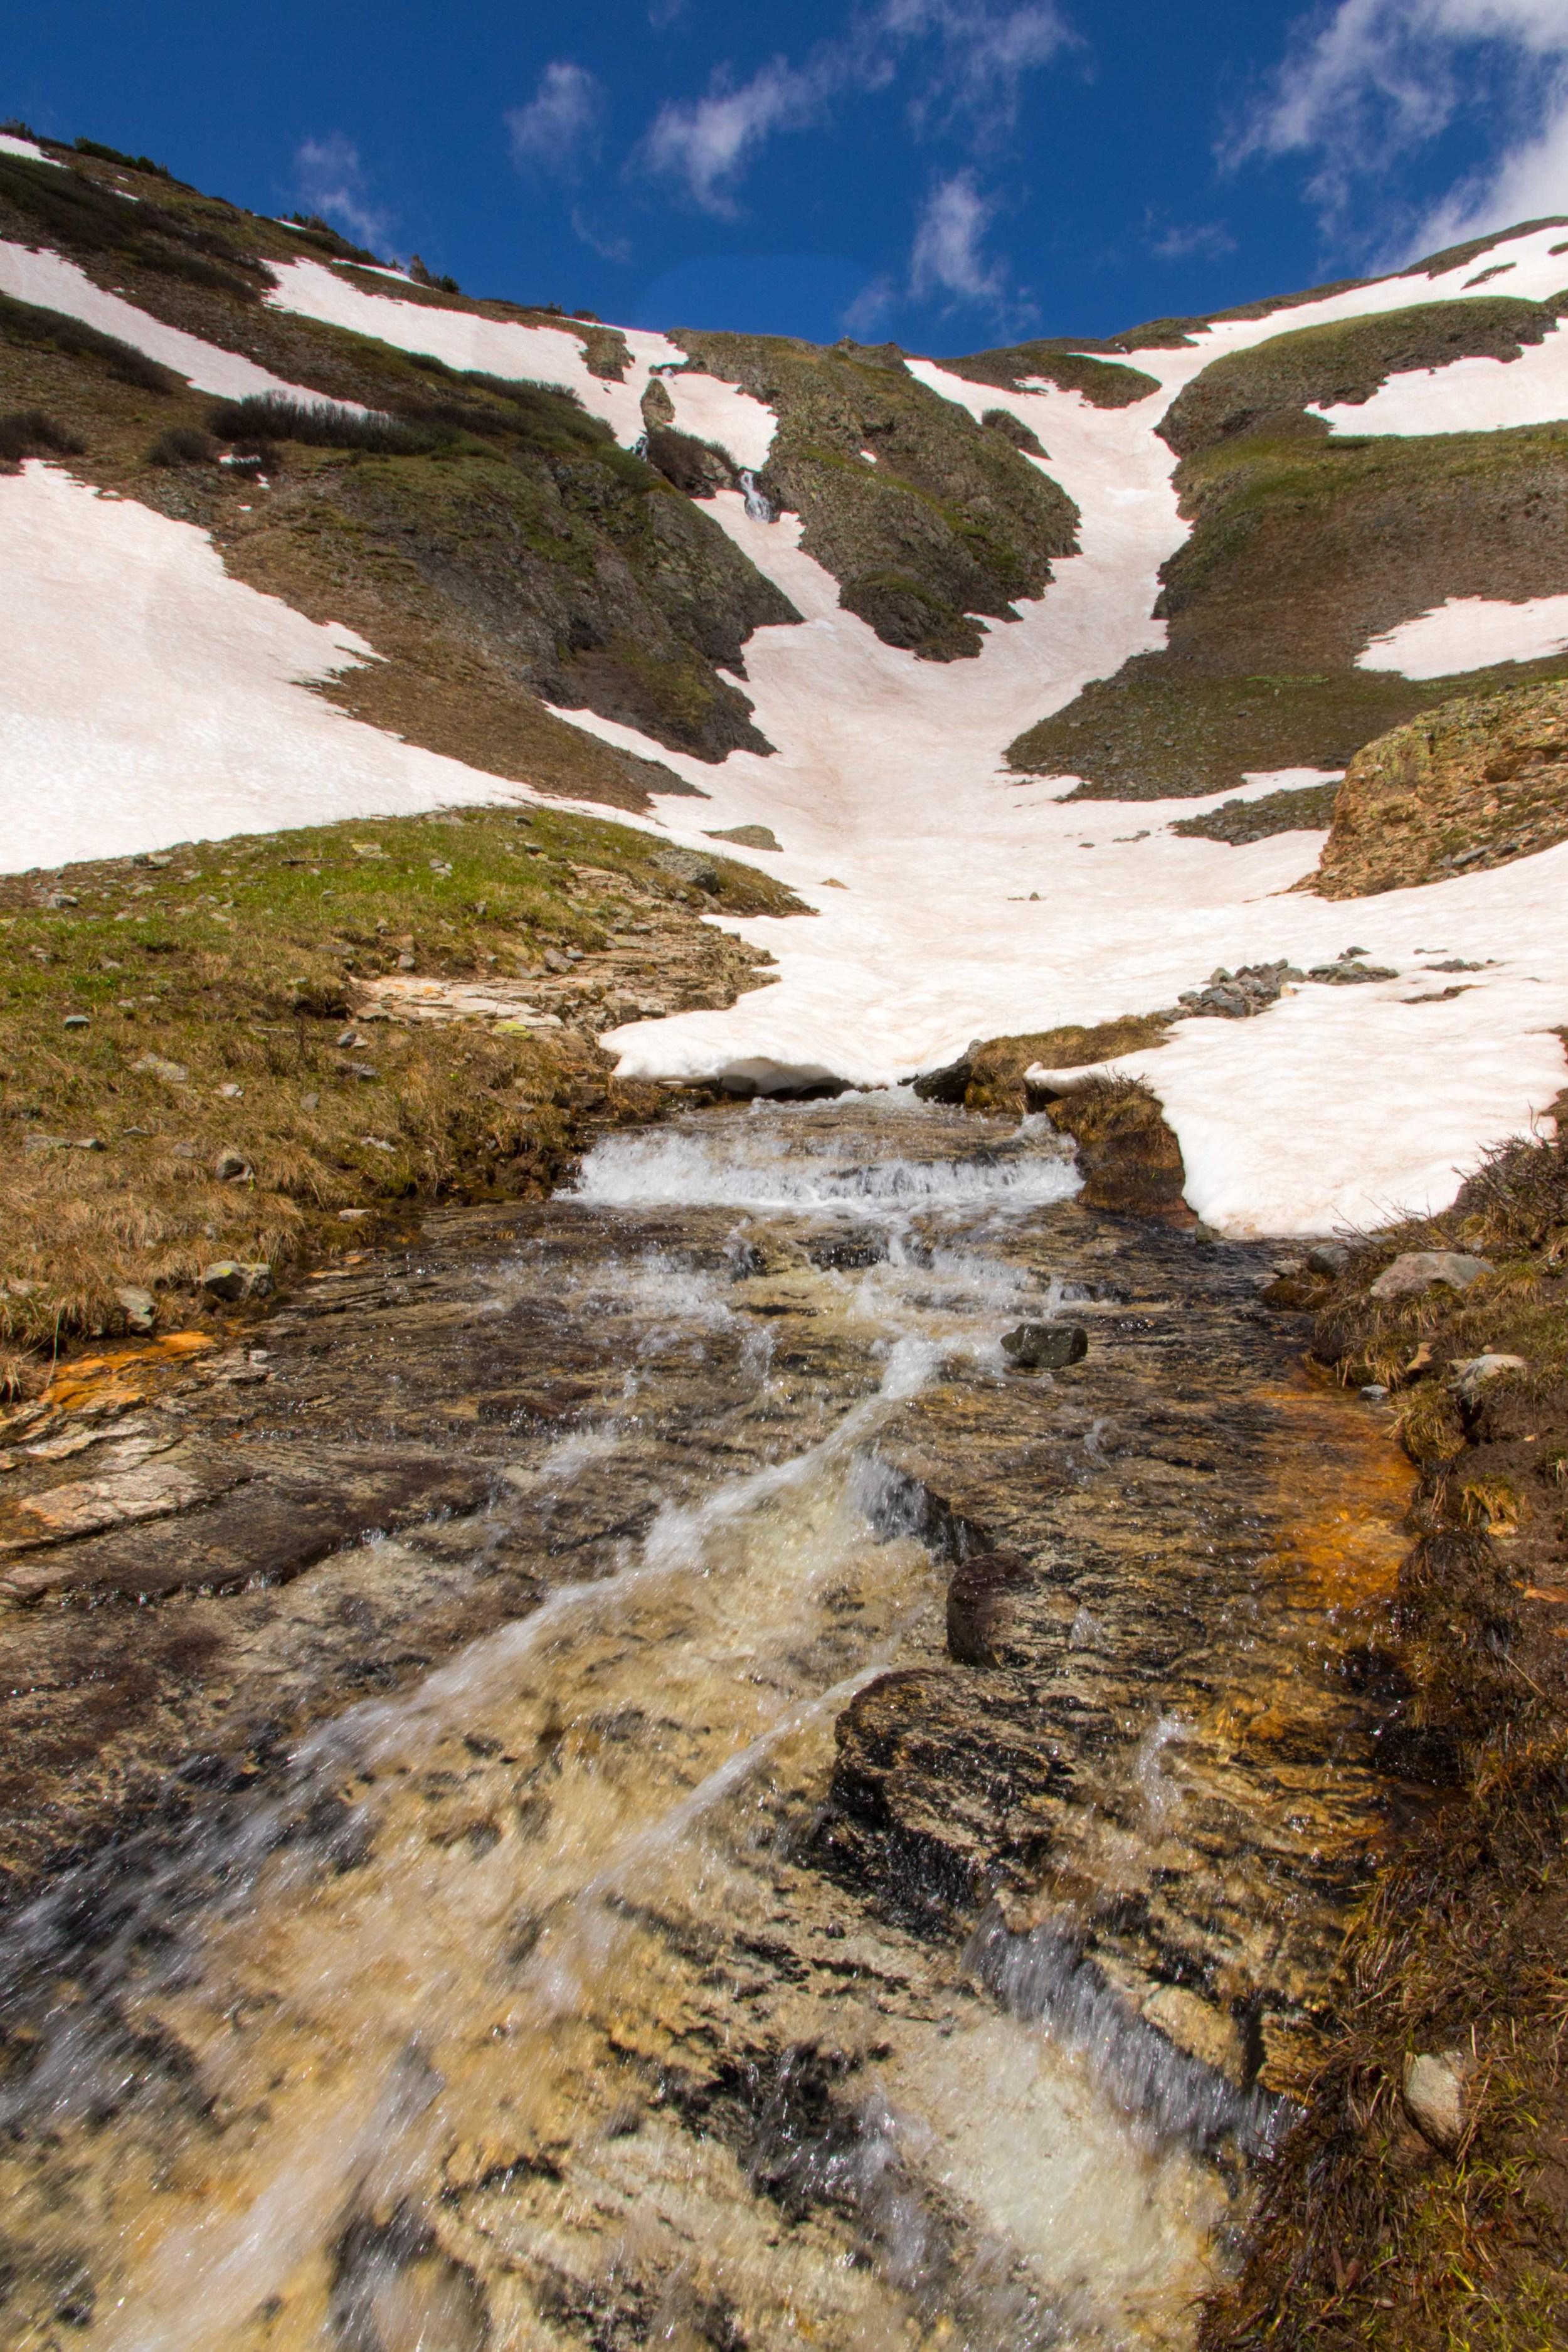 Black Bear Waterfall, Image # 0519